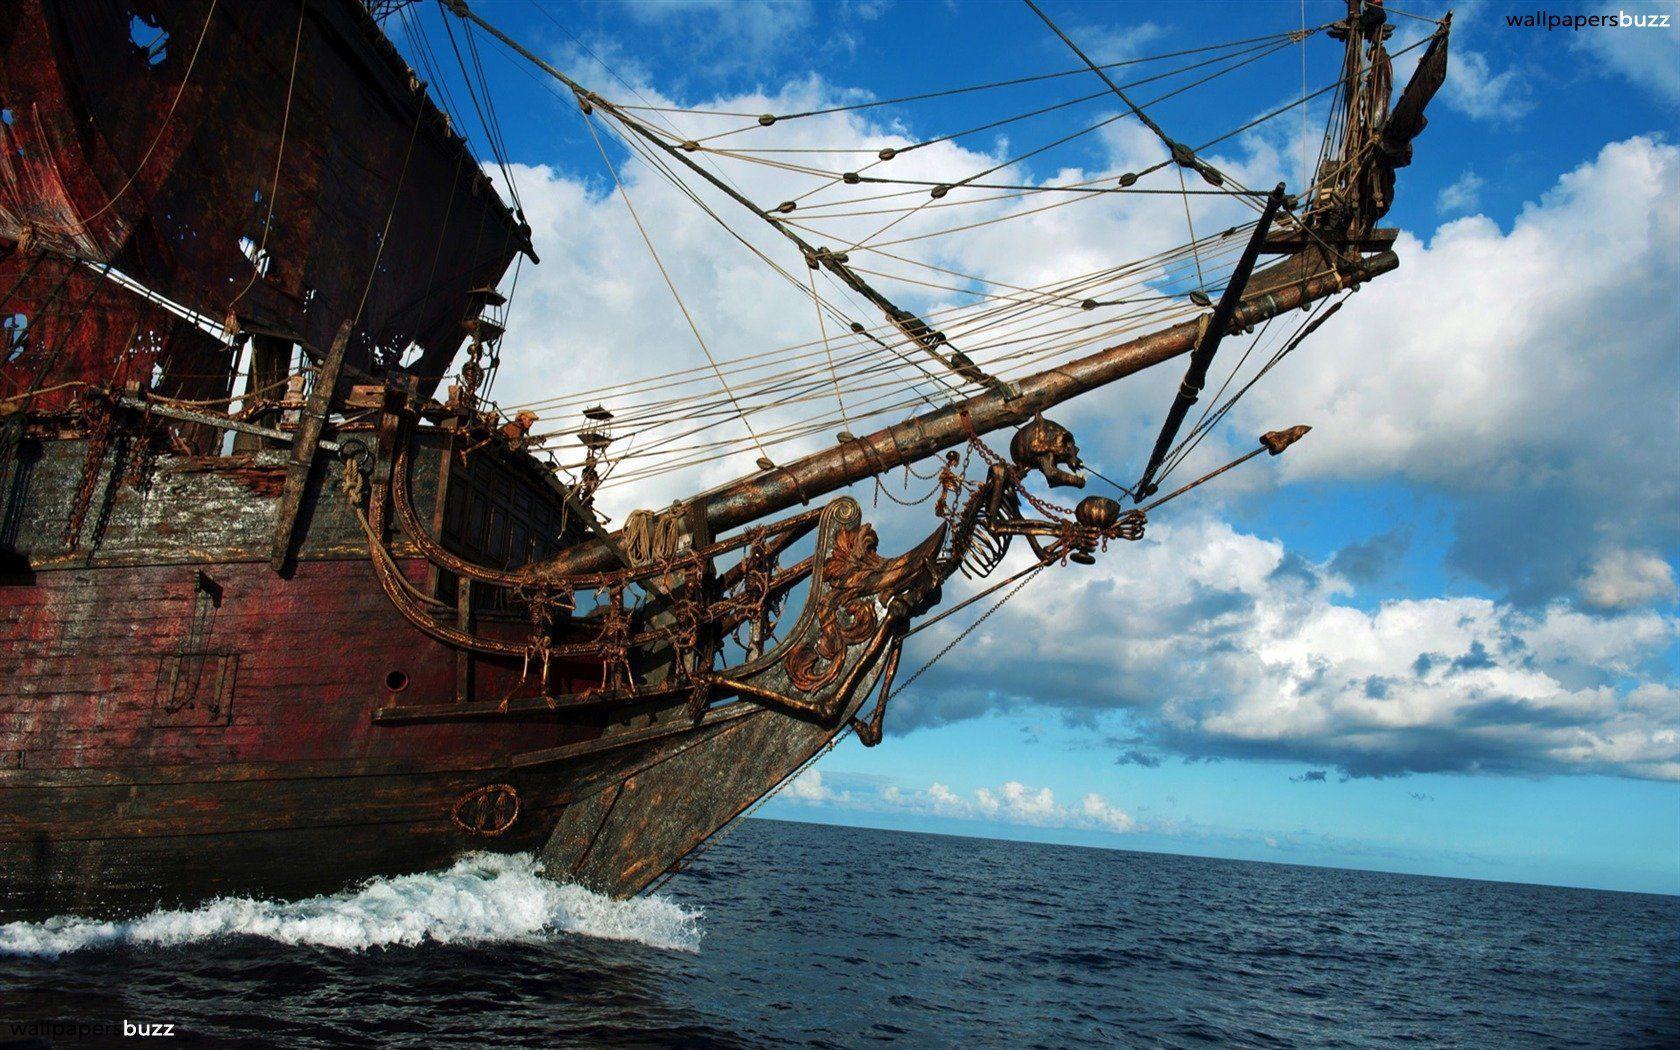 Pirate ship iphone wallpaper - photo#41